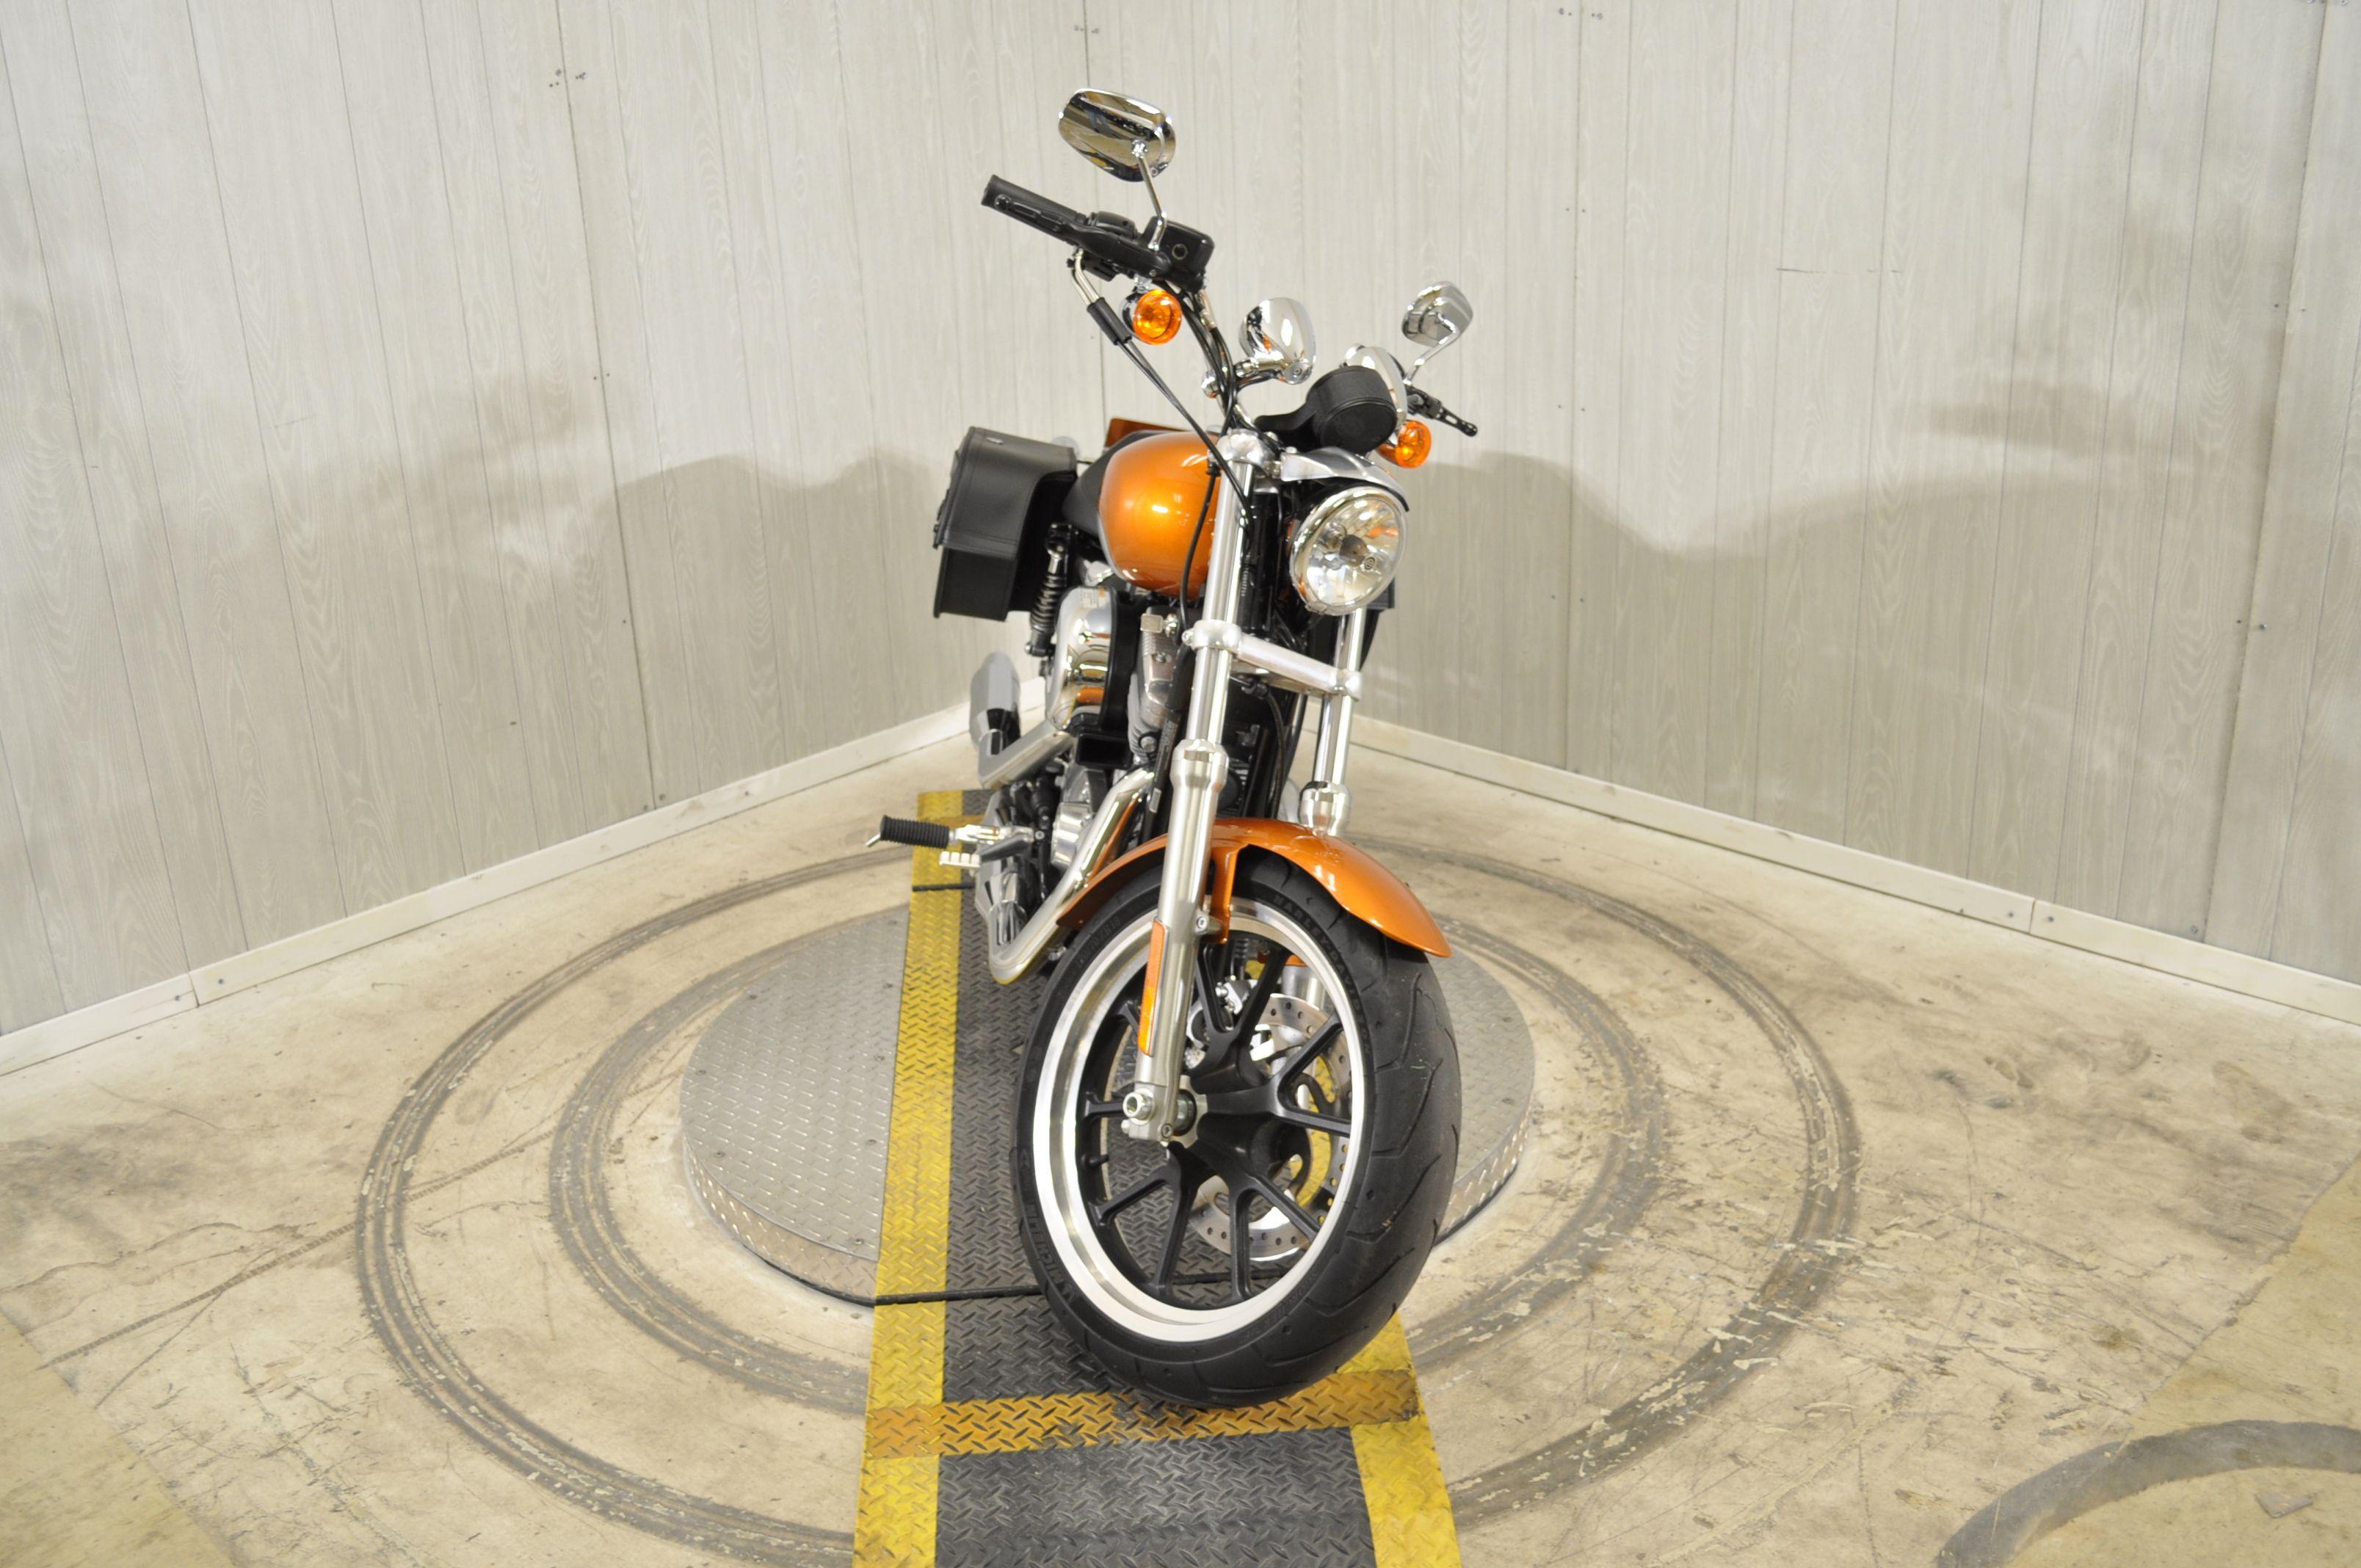 Pre-Owned 2014 Harley-Davidson SuperLow XL883L